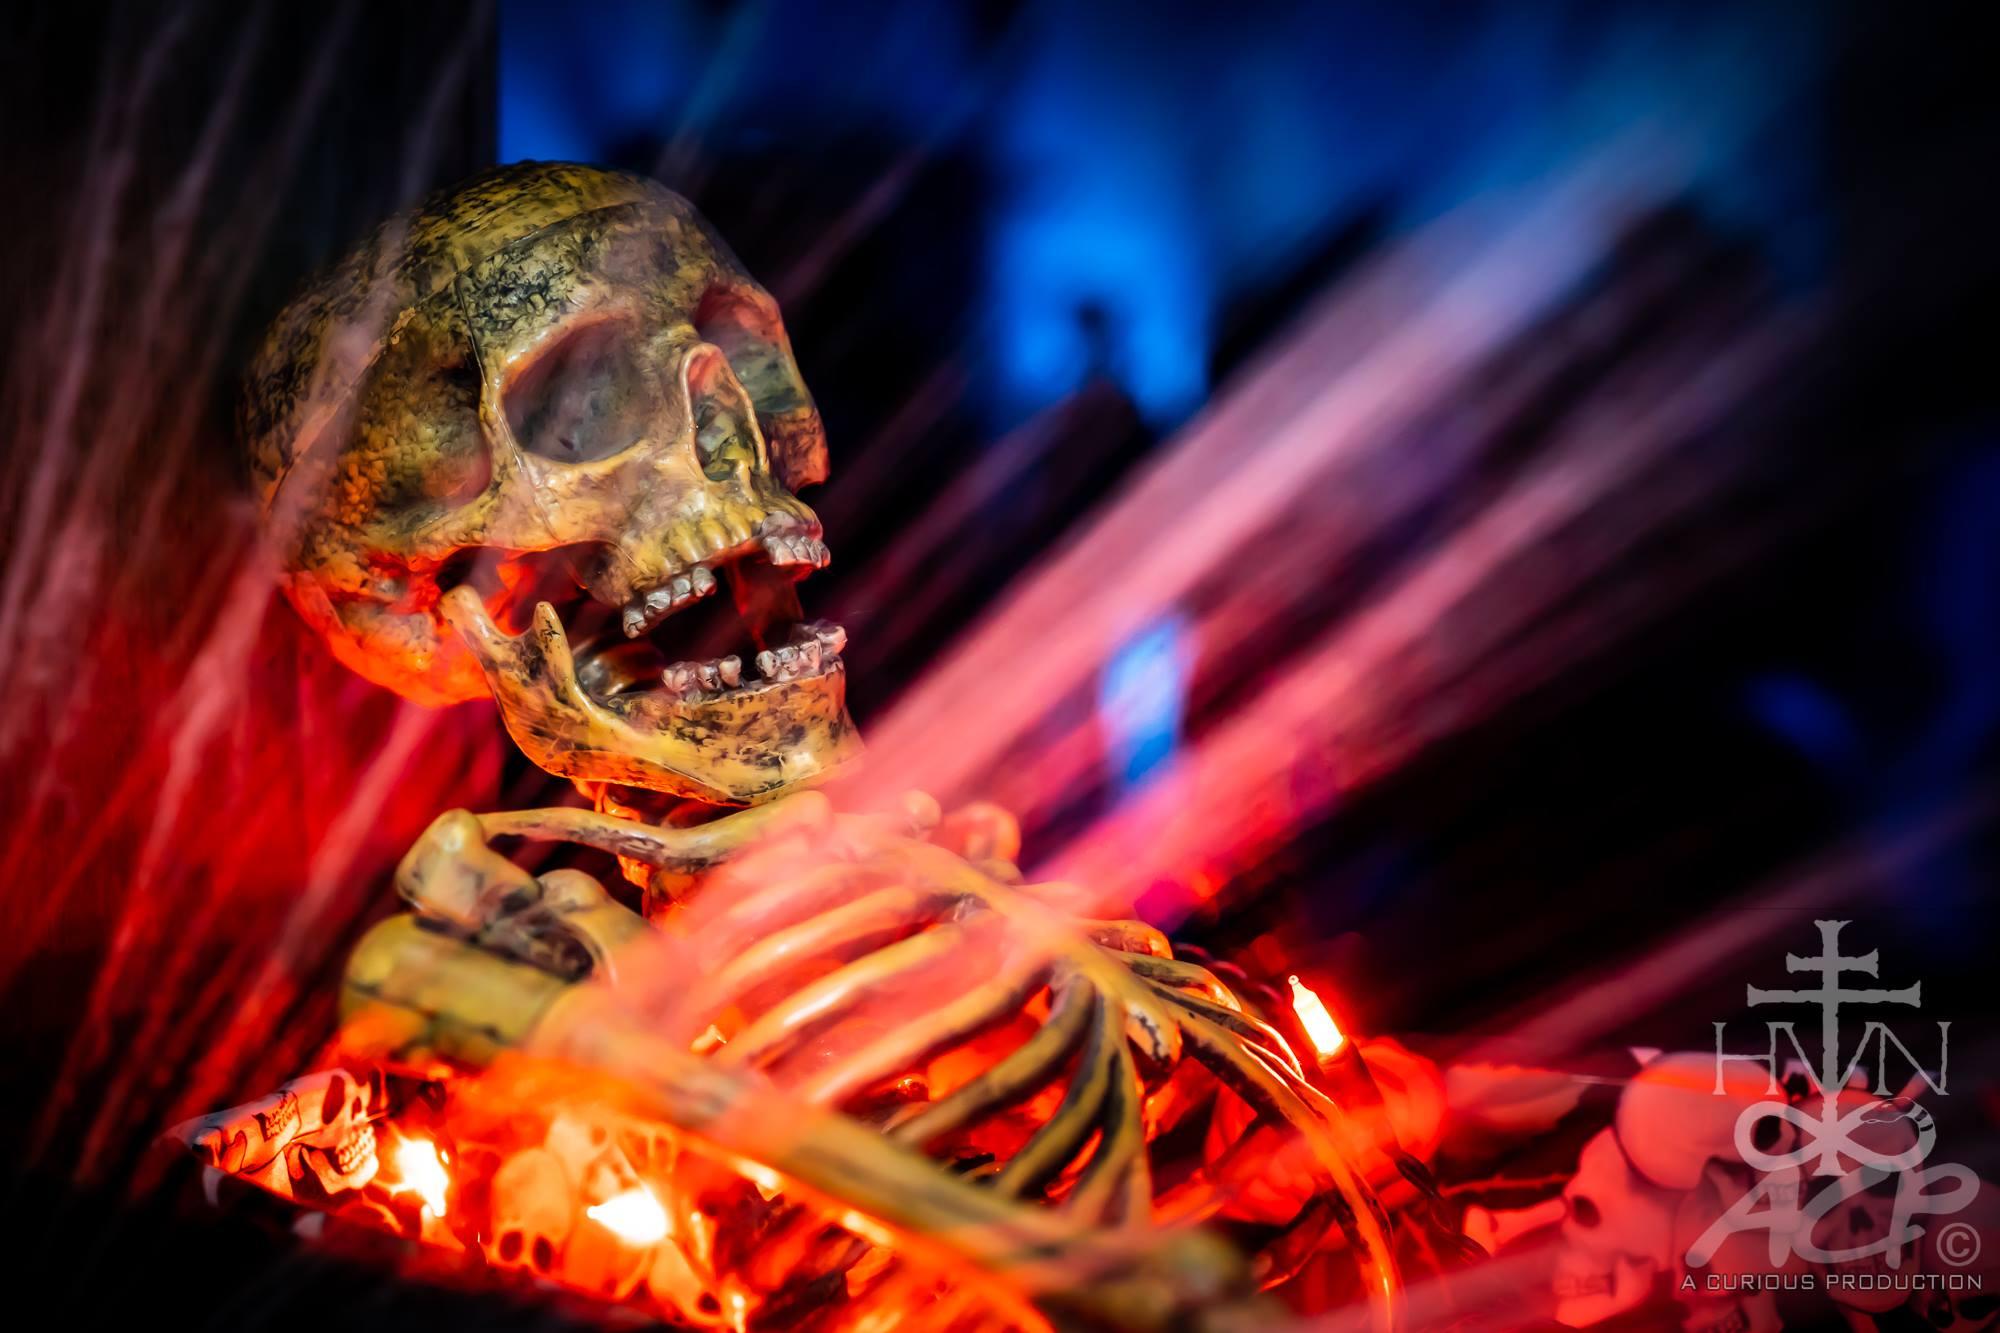 TheHavenClub-Goth-Industrial-Dance-Alternative-Northampton-MA -Halloween 2018 (80).jpg